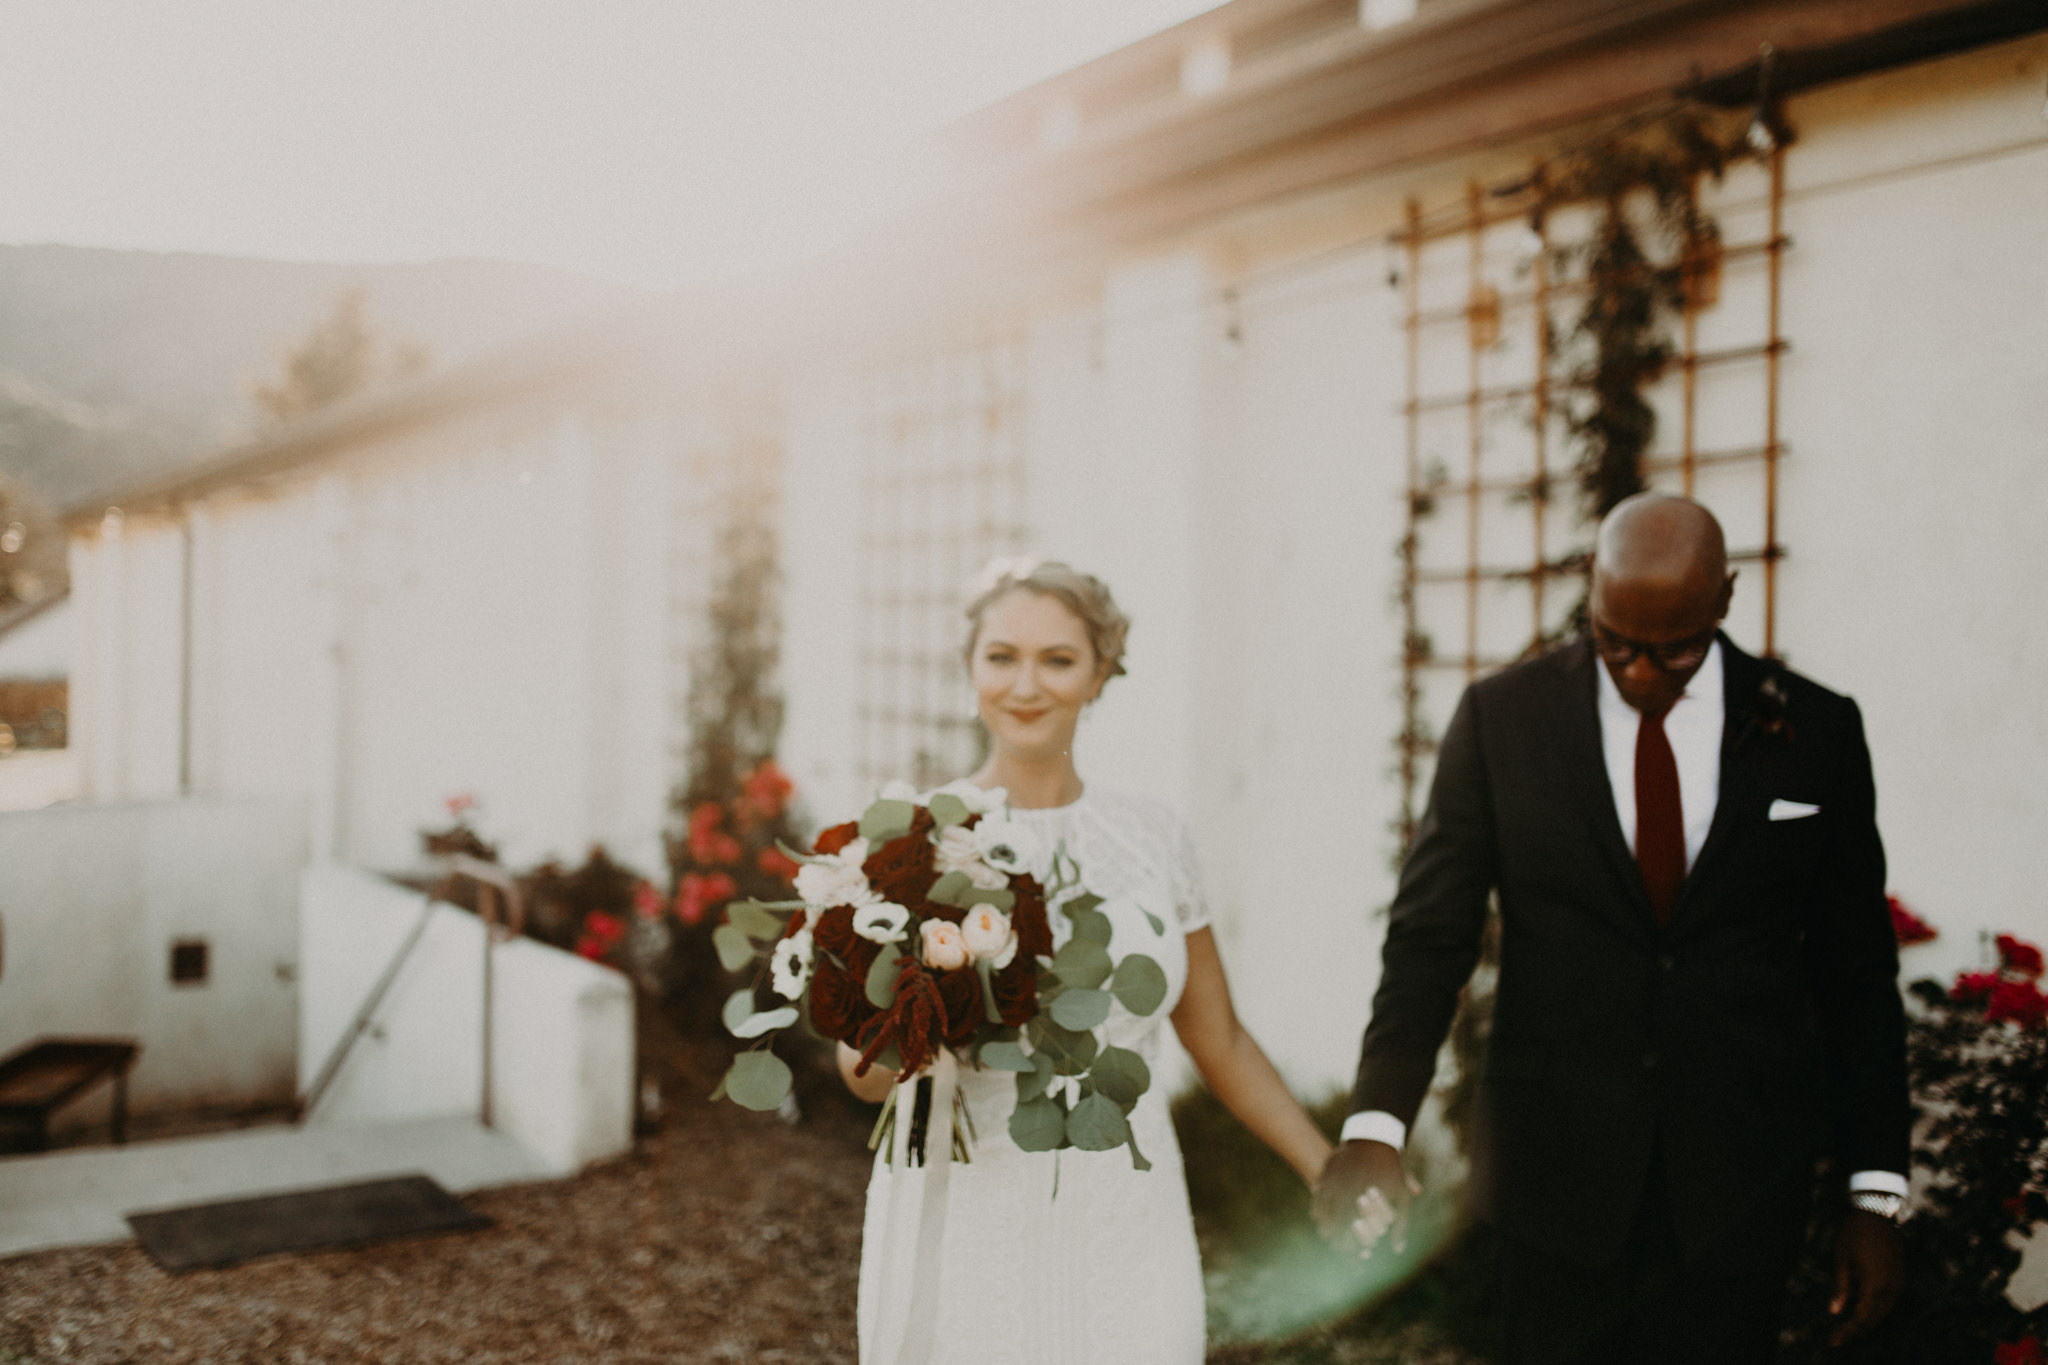 couple-wedding-carmel-wedding-31.jpg